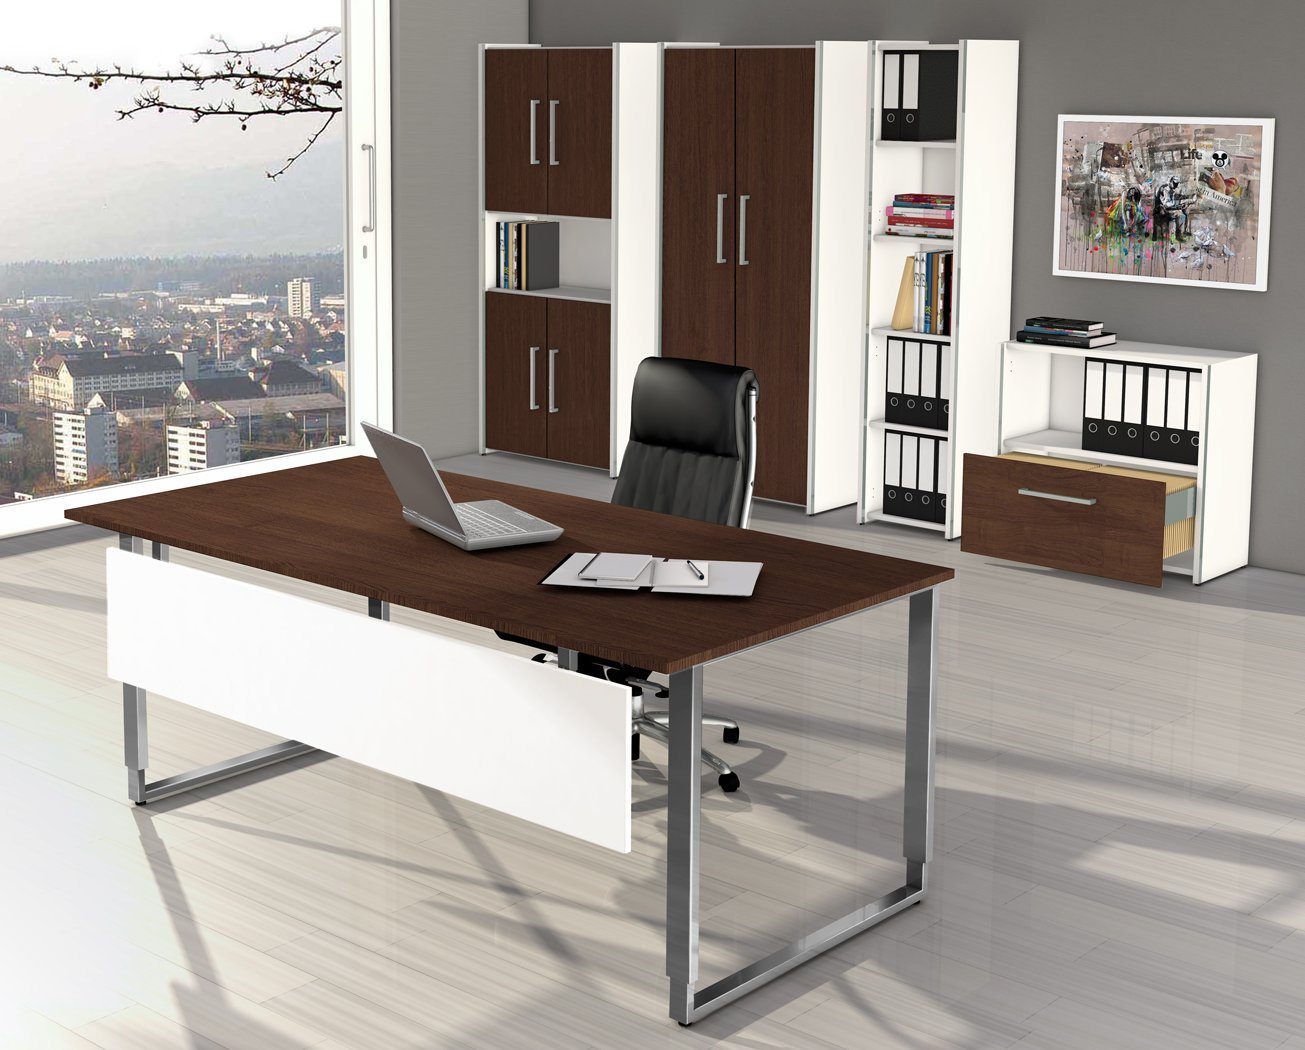 Moderne büromöbel weiss  robuste Büromöbel aus Holz (weiß / Wenge-Dekor) und Edelstahl